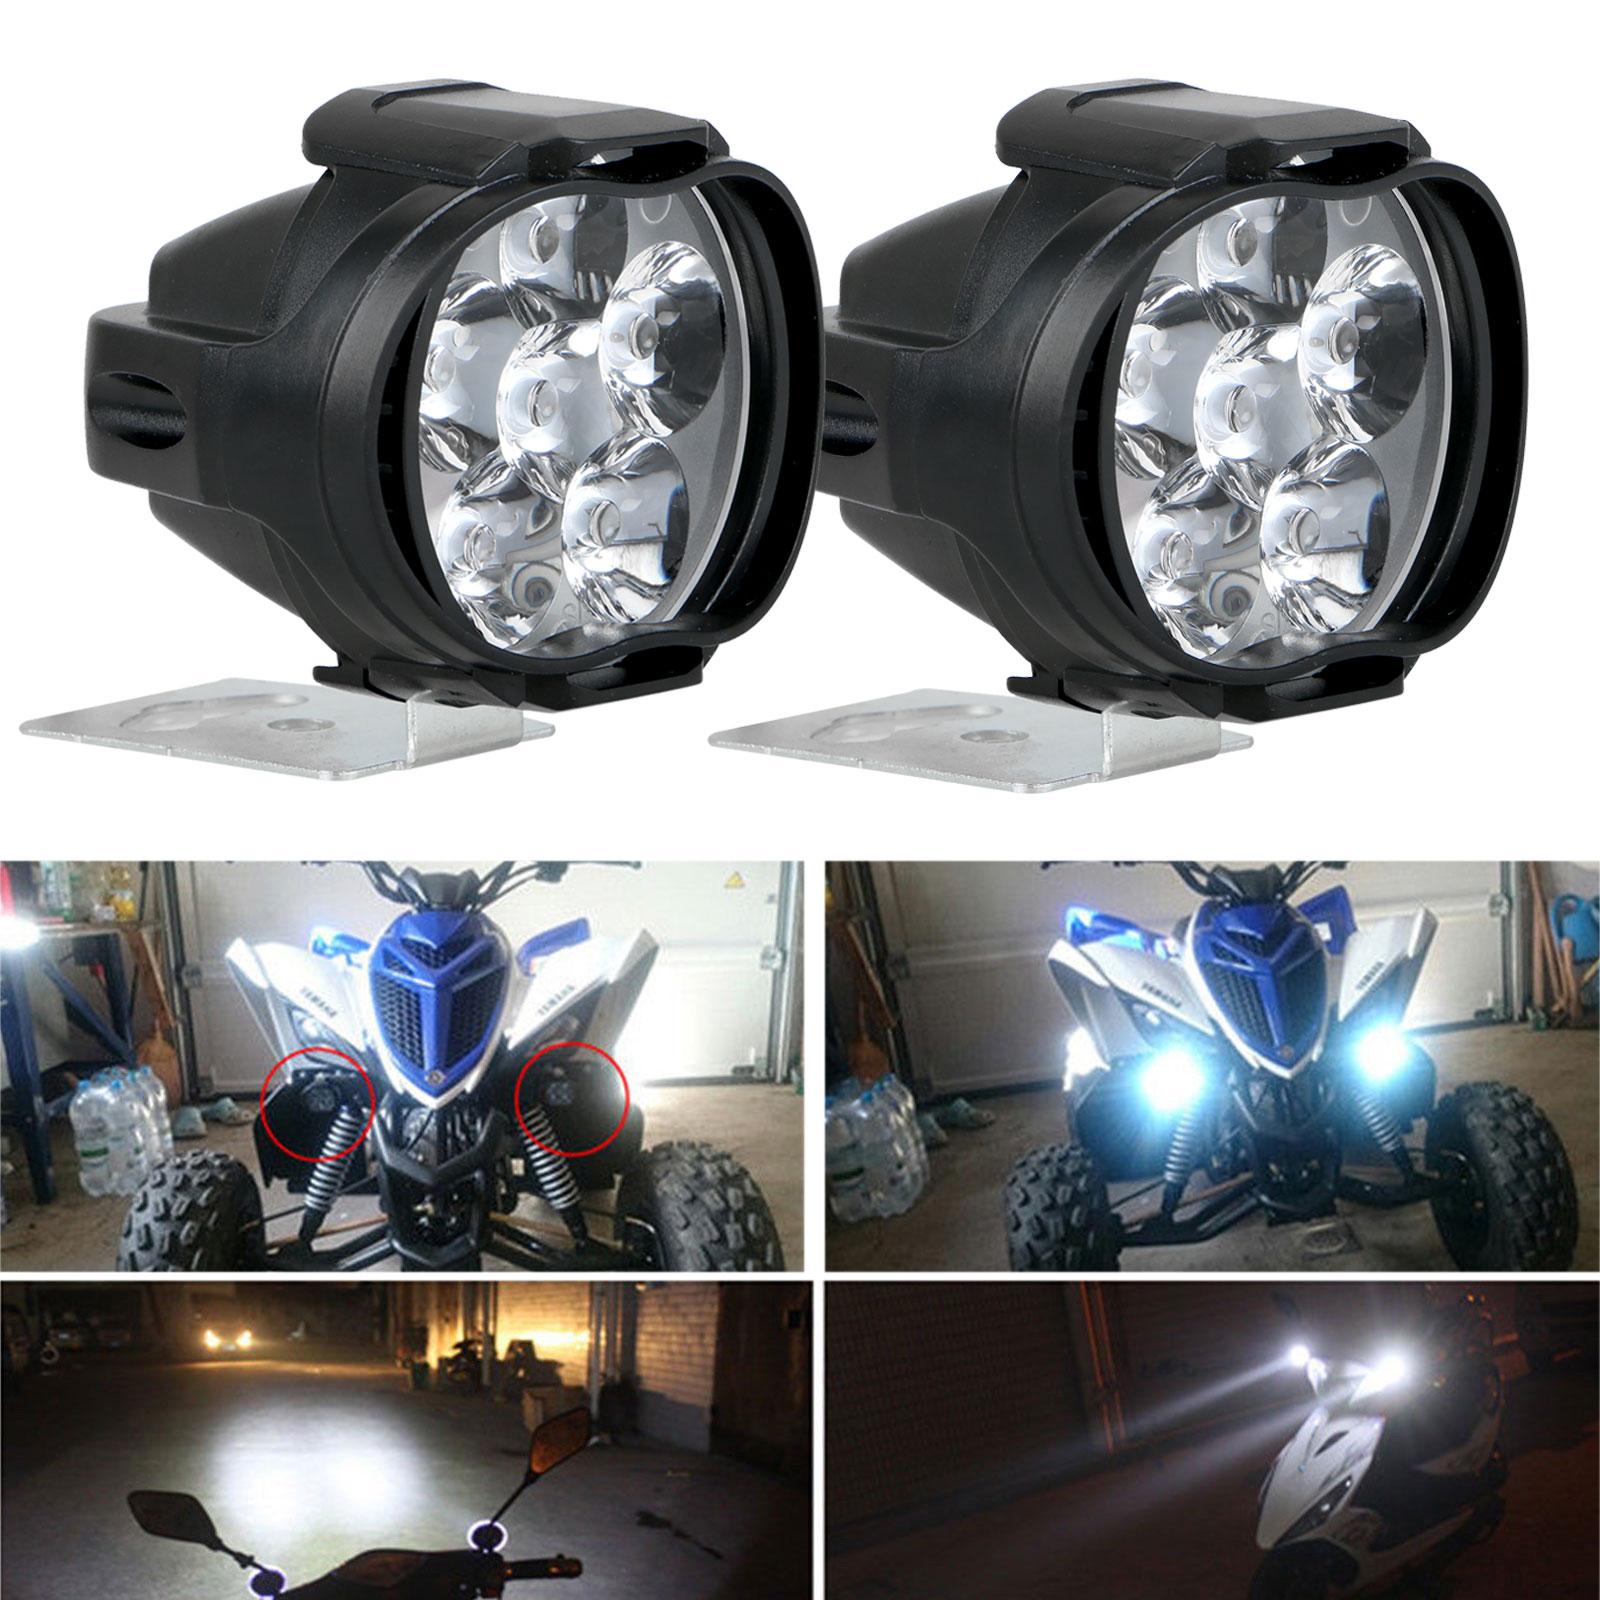 2Pcs-Universal-Car-SUV-Motorcycle-LED-Waterproof-Lights-Fog-Light-Headlight-Lamp thumbnail 10